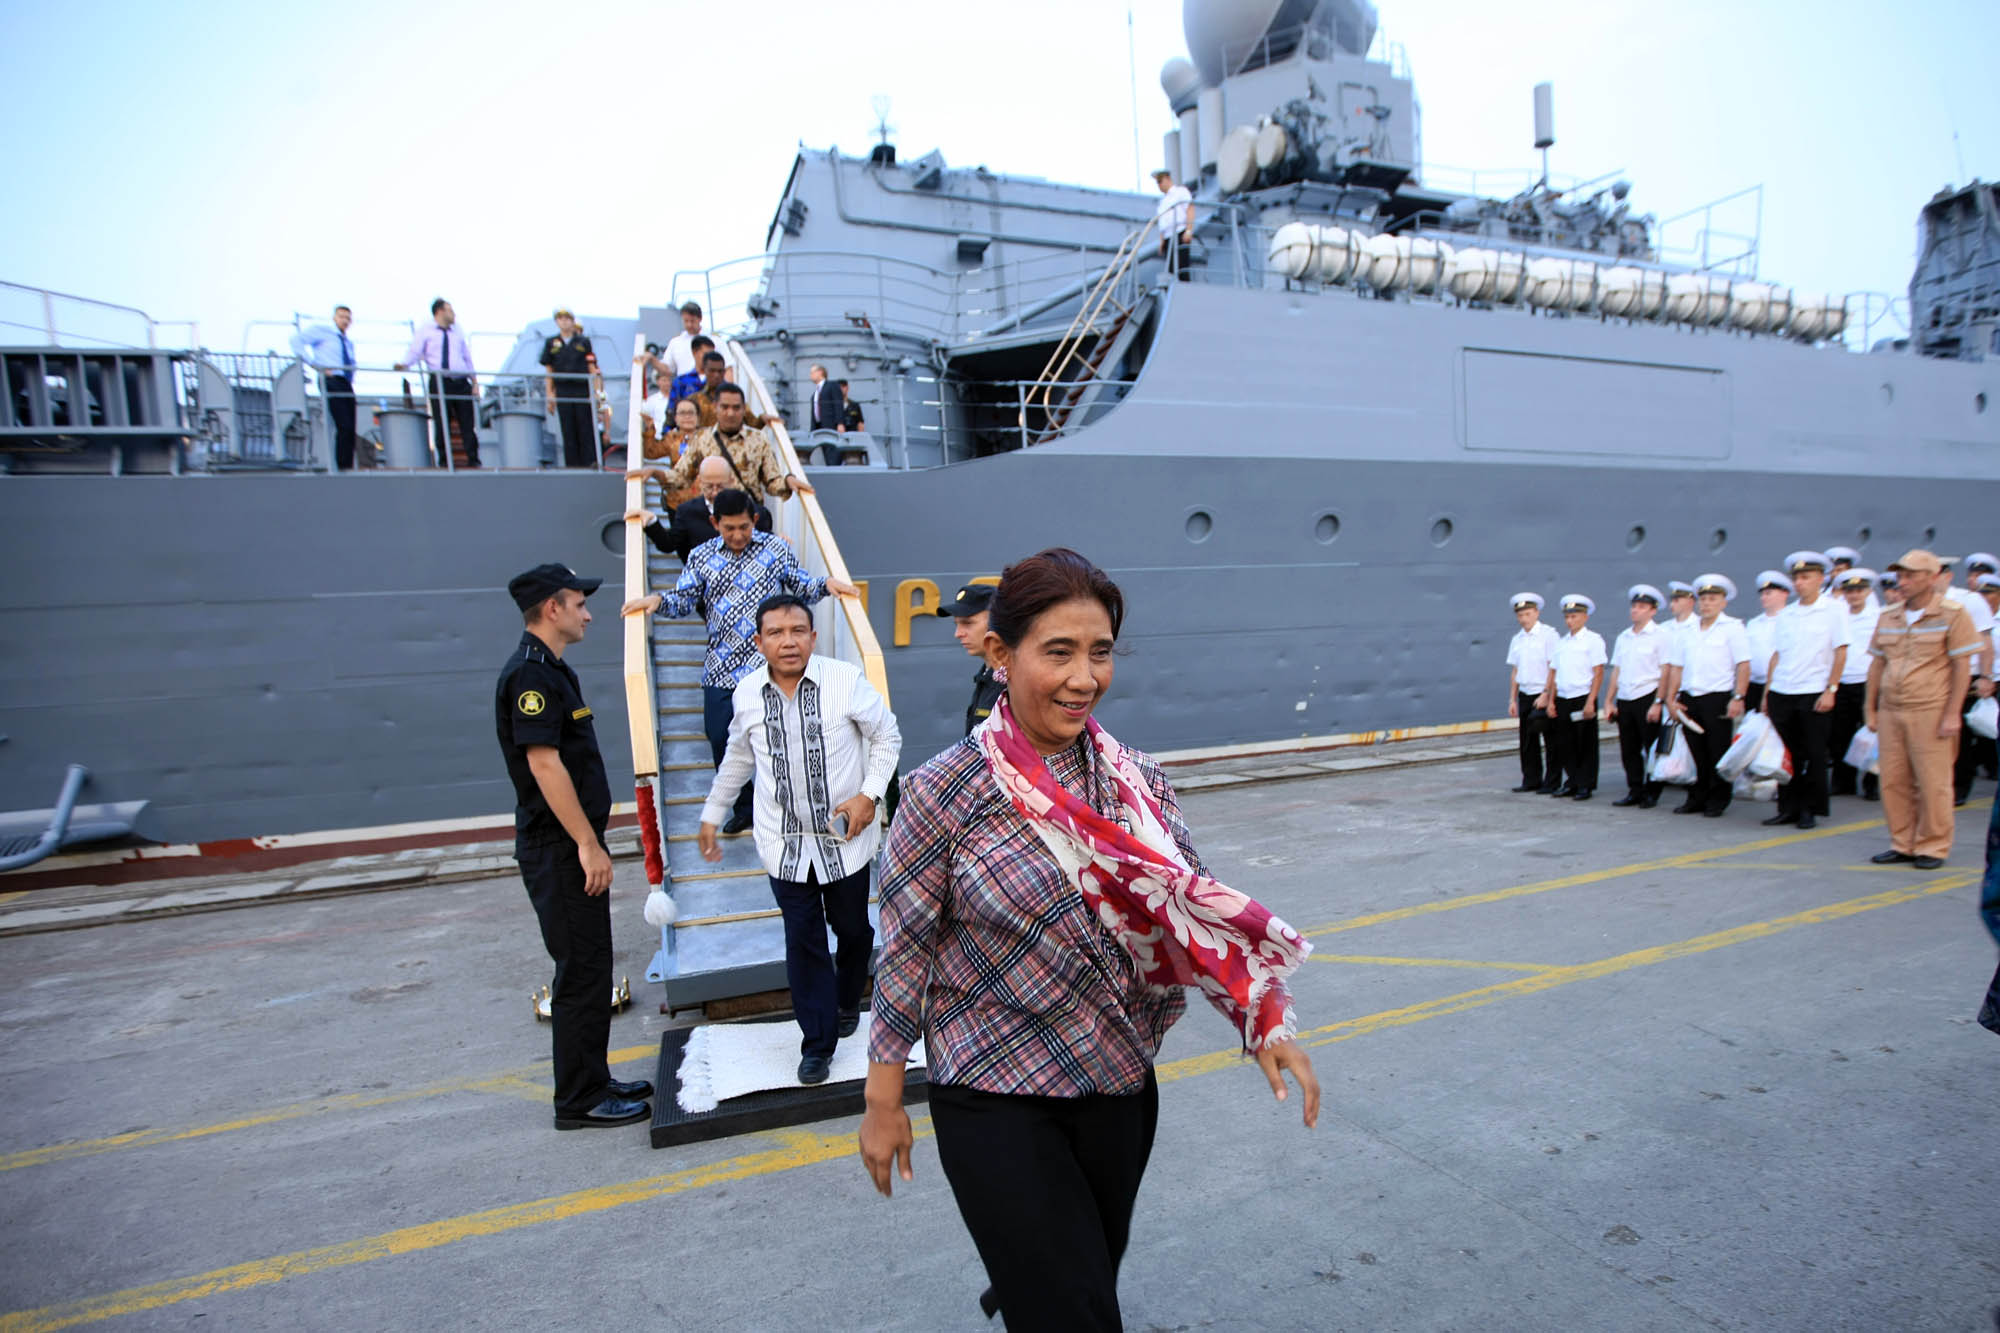 Menteri Kelautan dan Perikanan Susi Pudji Astuti meninggalkan kapal jelajah Rusia 'Varyag' di Pelabuhan JICT 2, Tanjung Priok, Jakarta, Selasa (23/5).